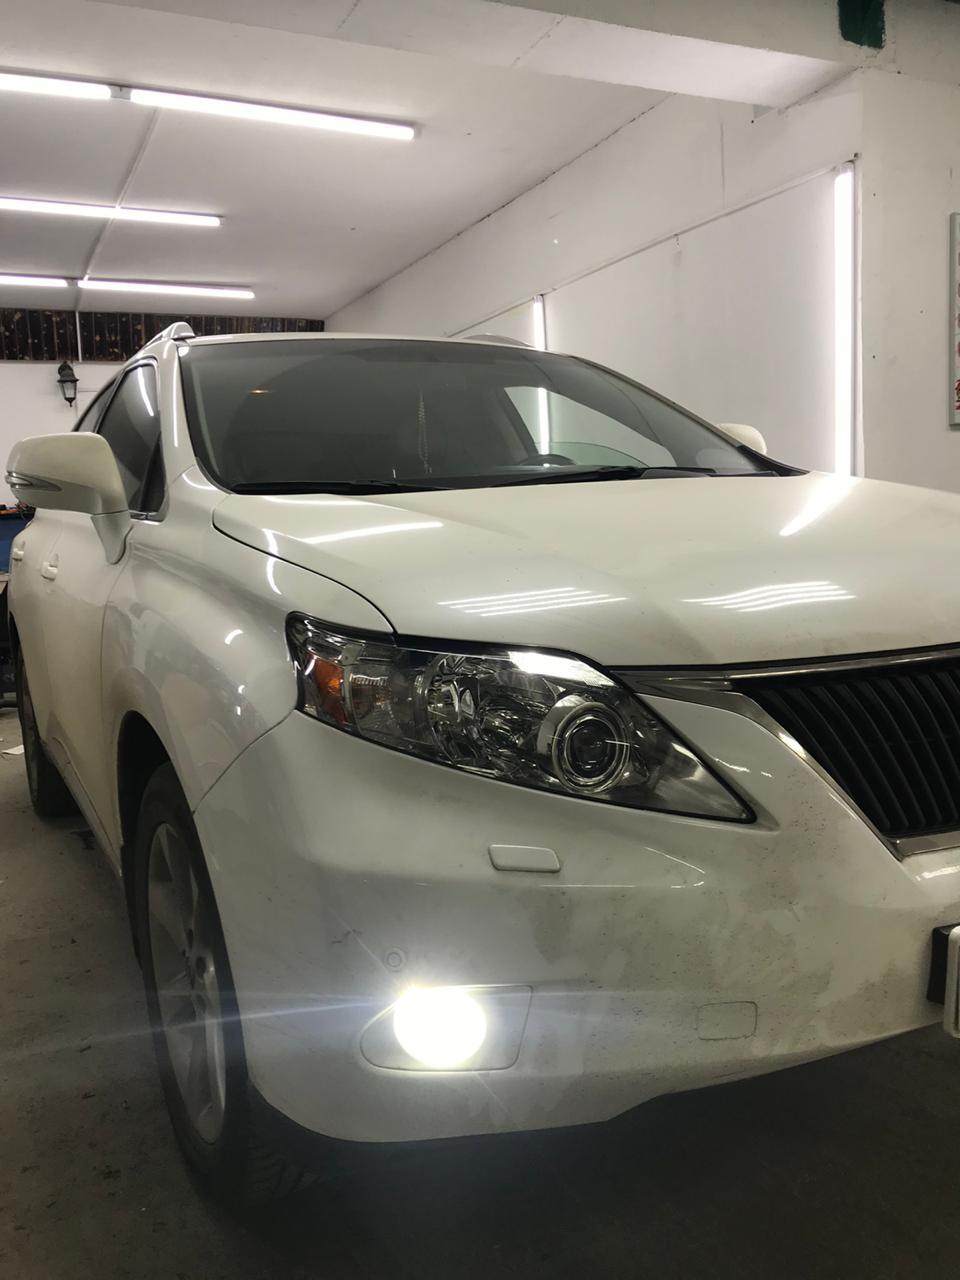 Замена ксеноновых линз Lexus RX на bi led